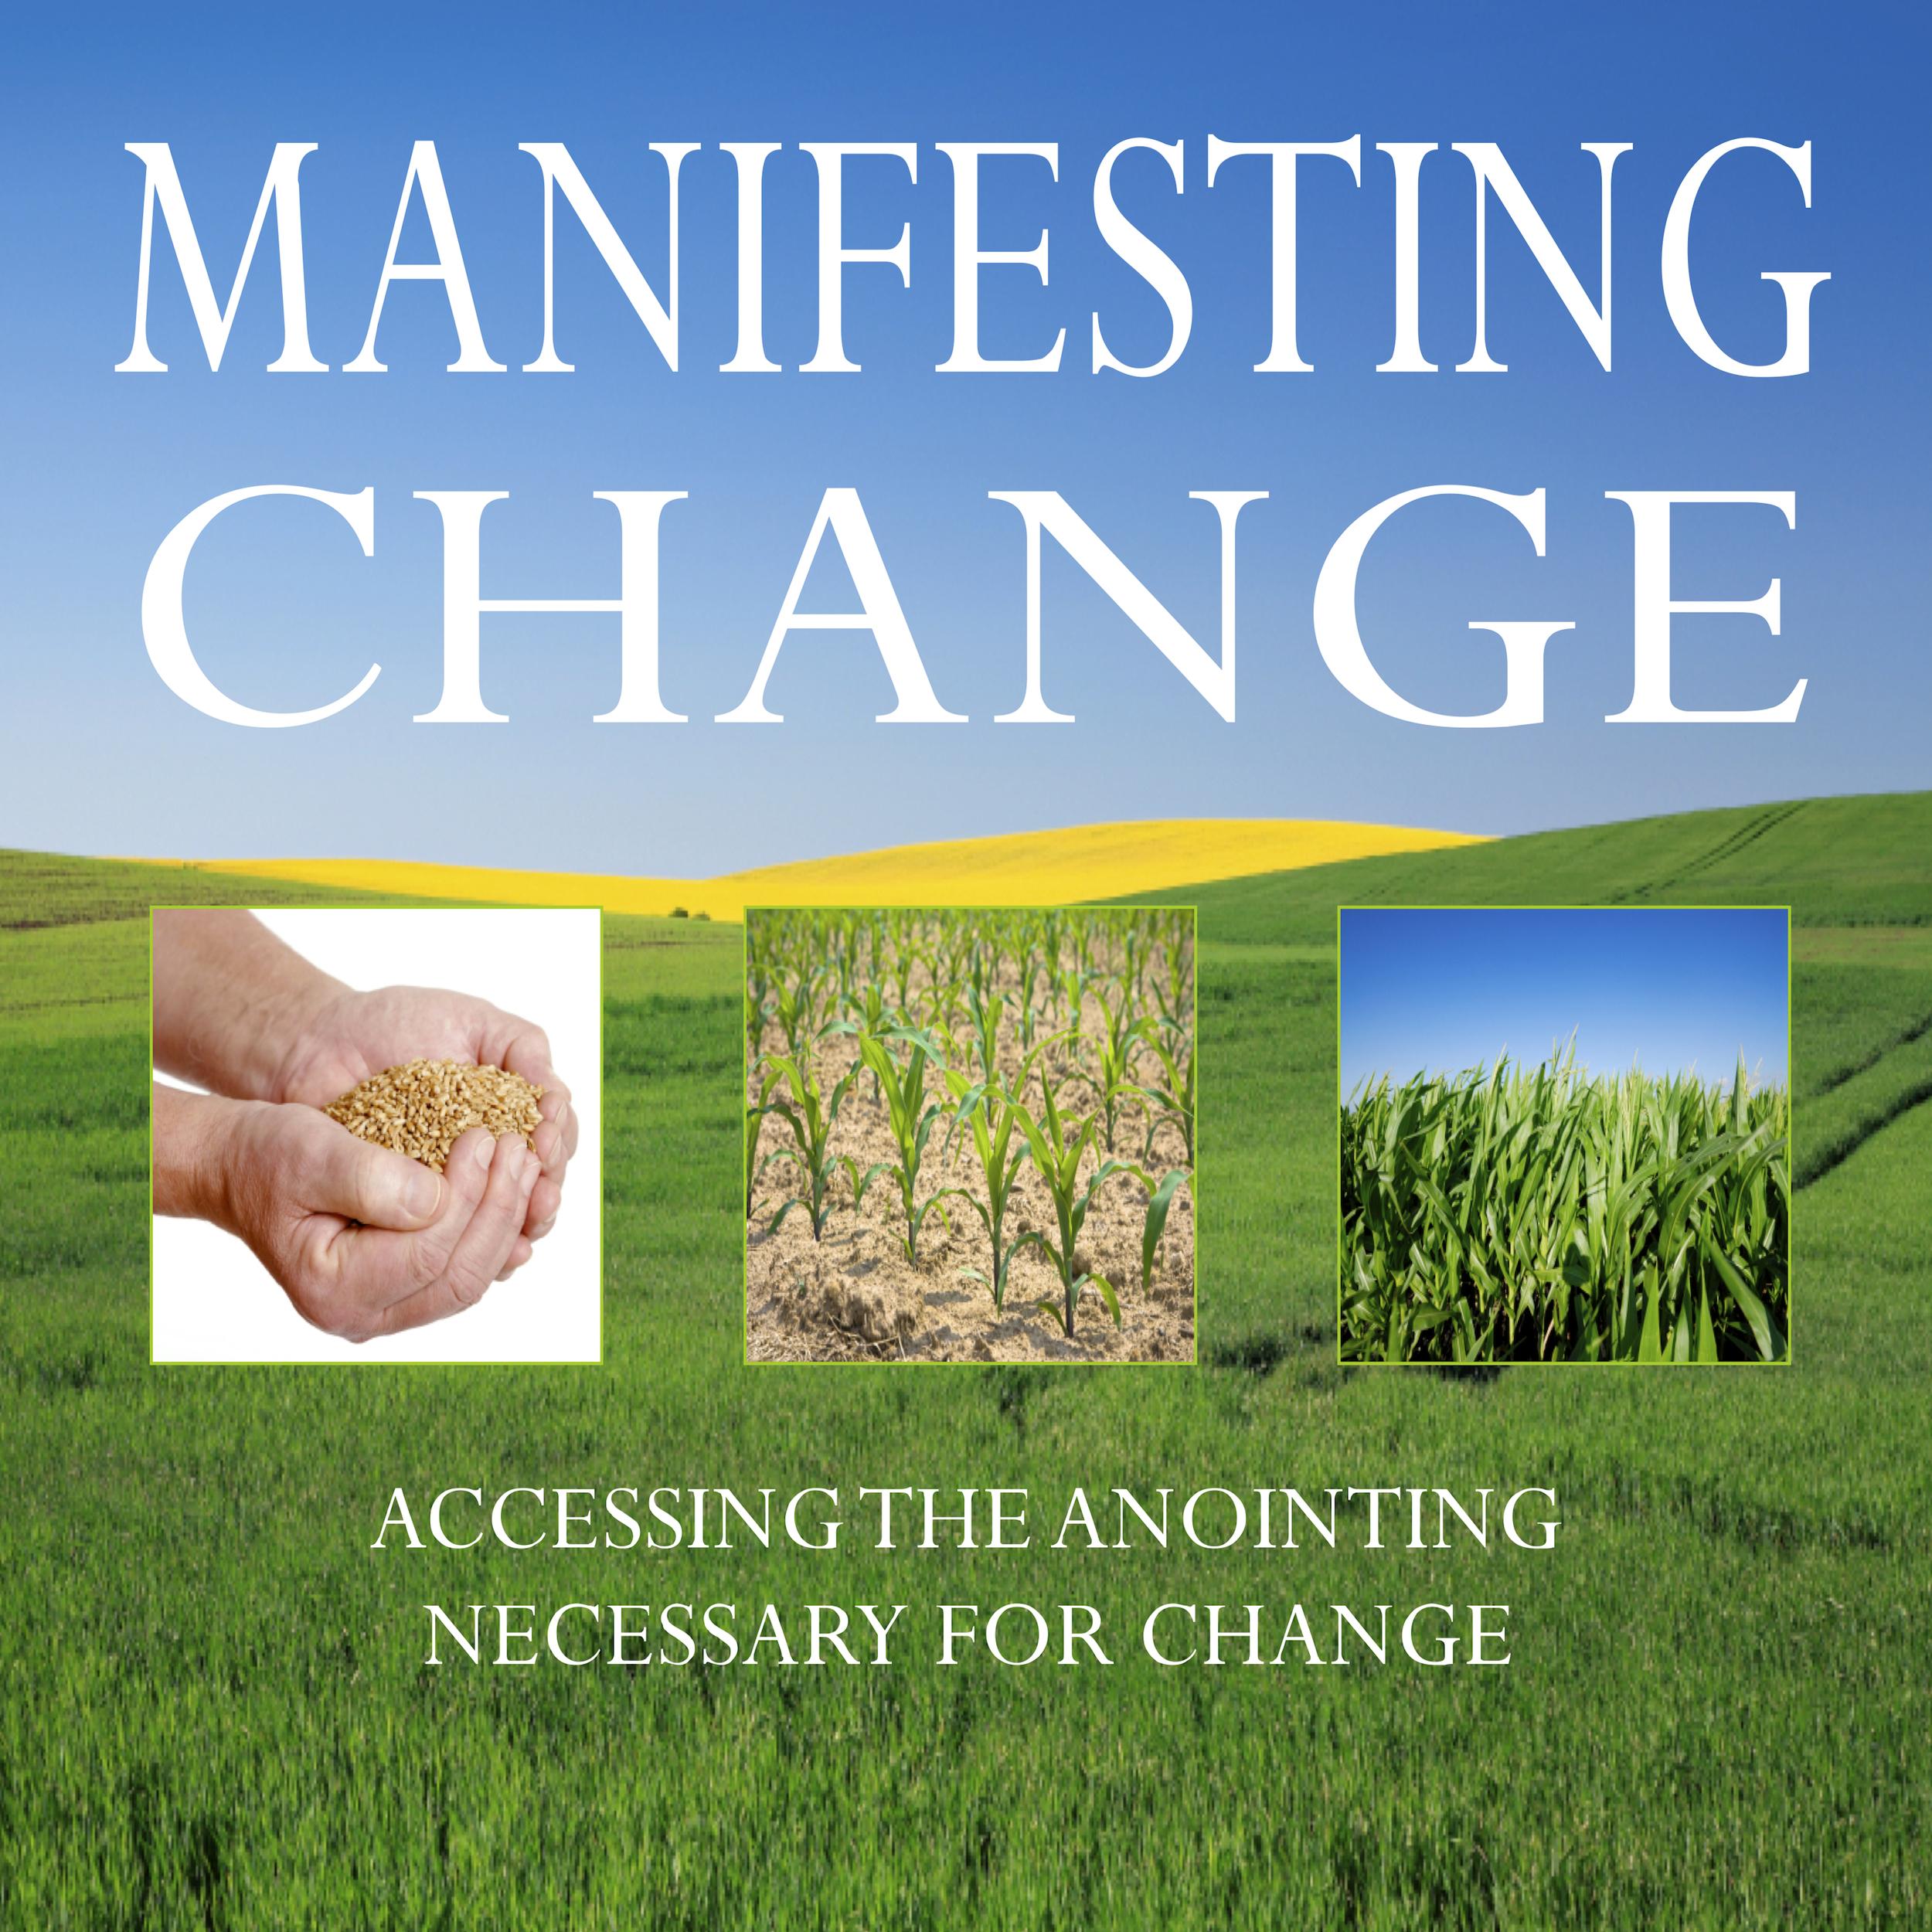 Manifesting Change Cover Pic.jpg